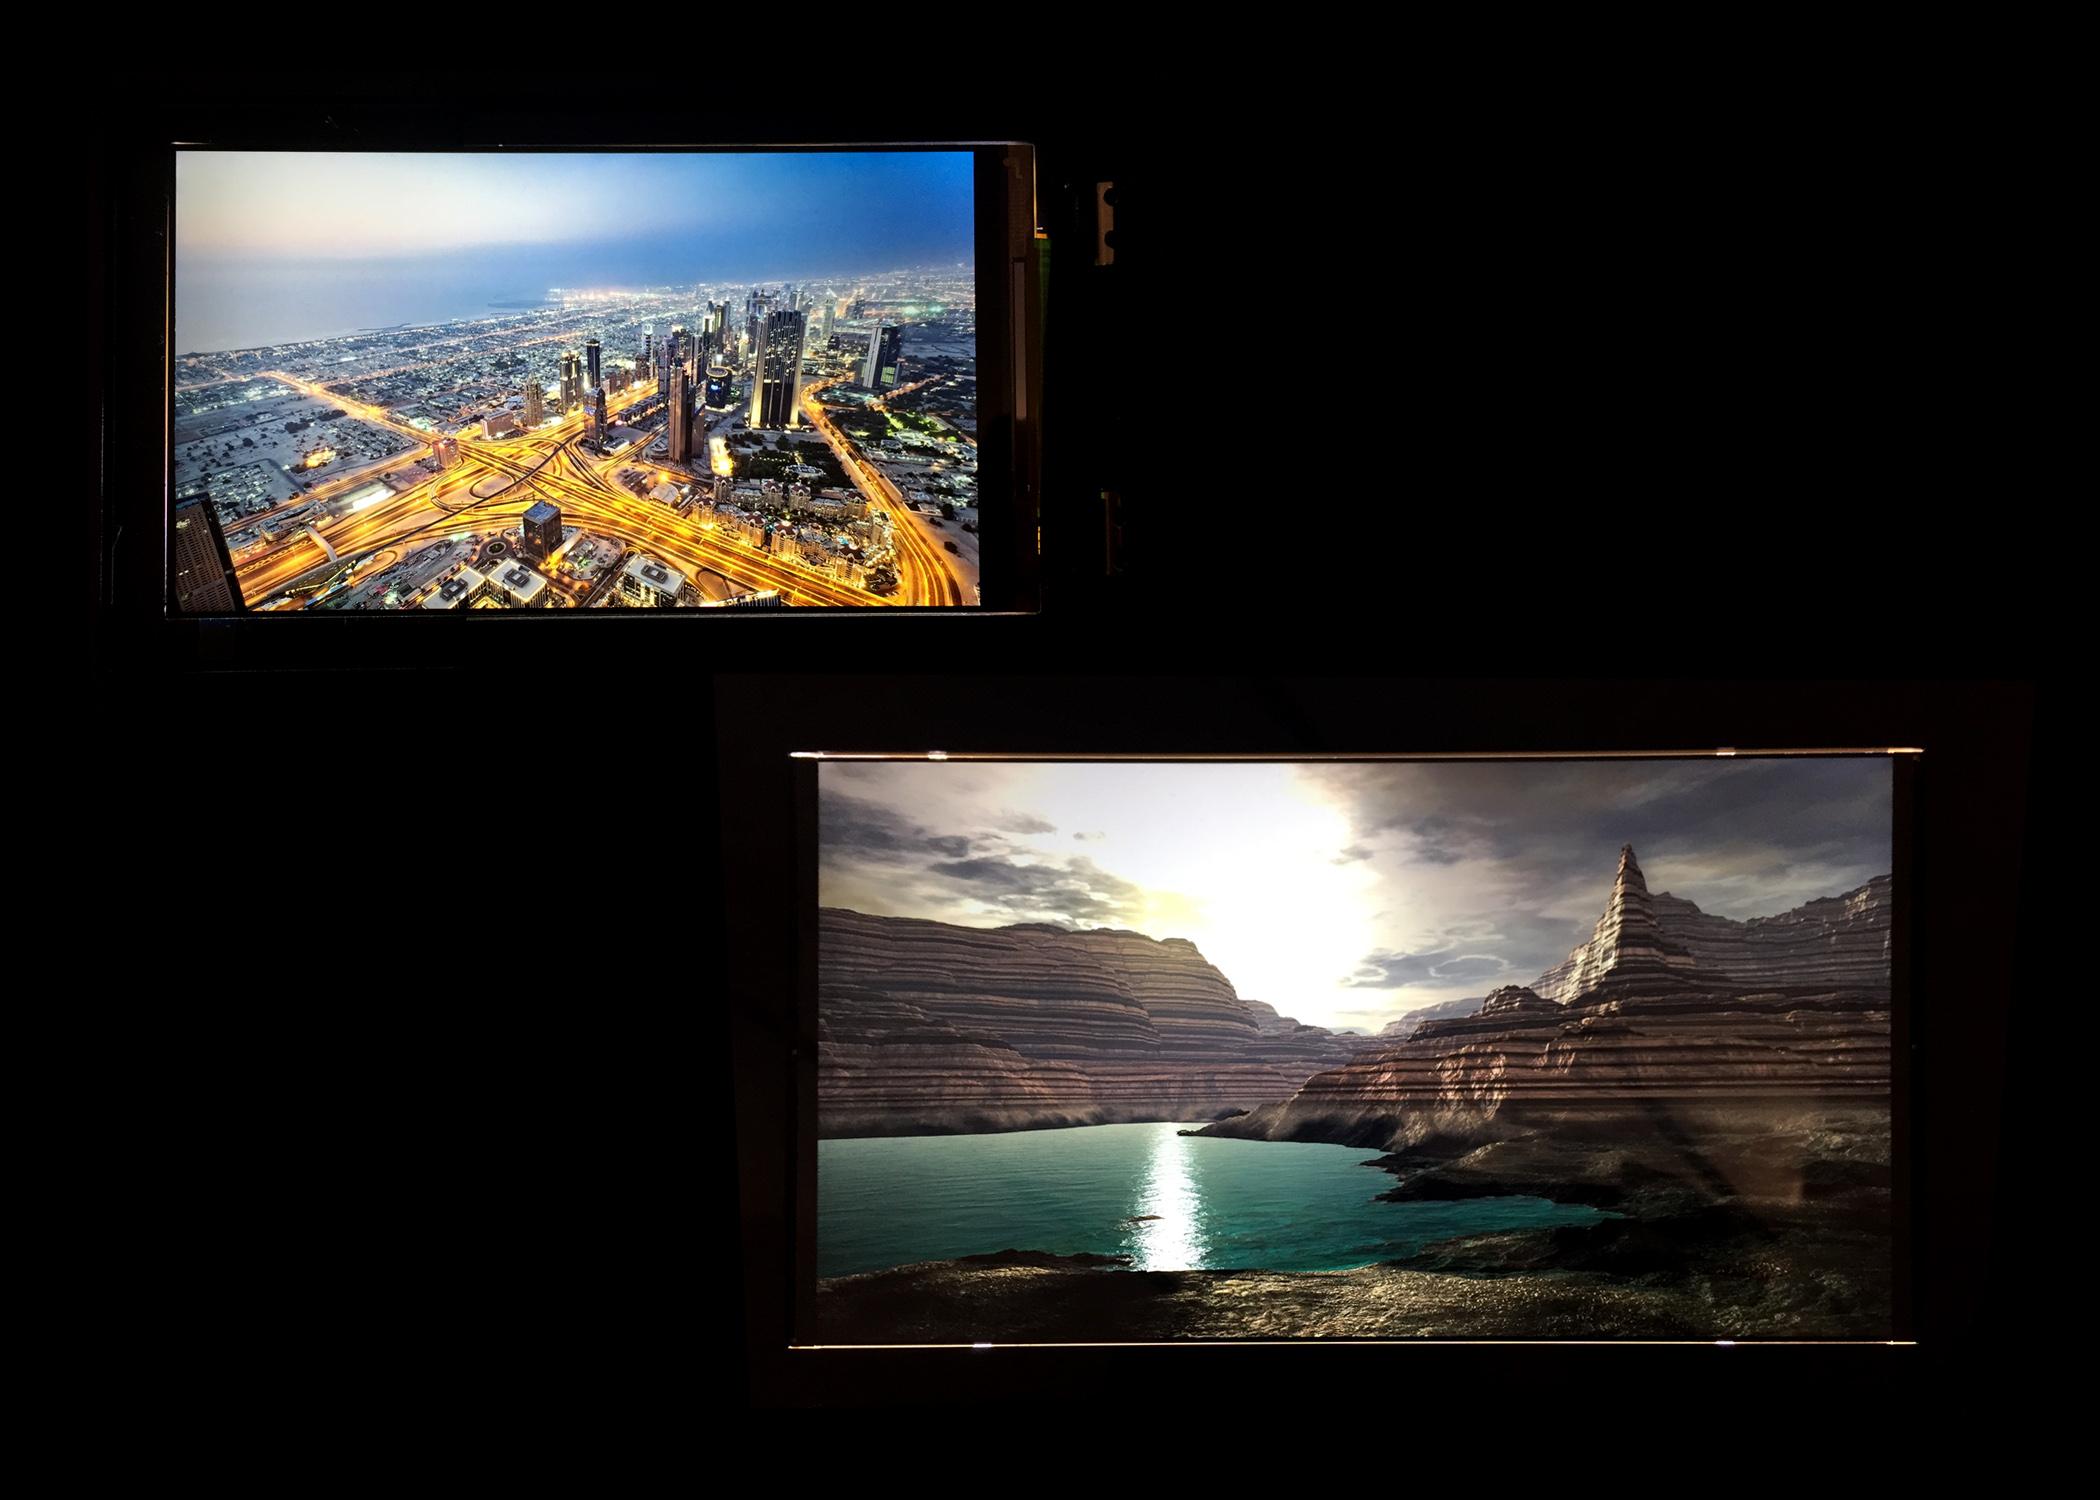 tianma 4k screen